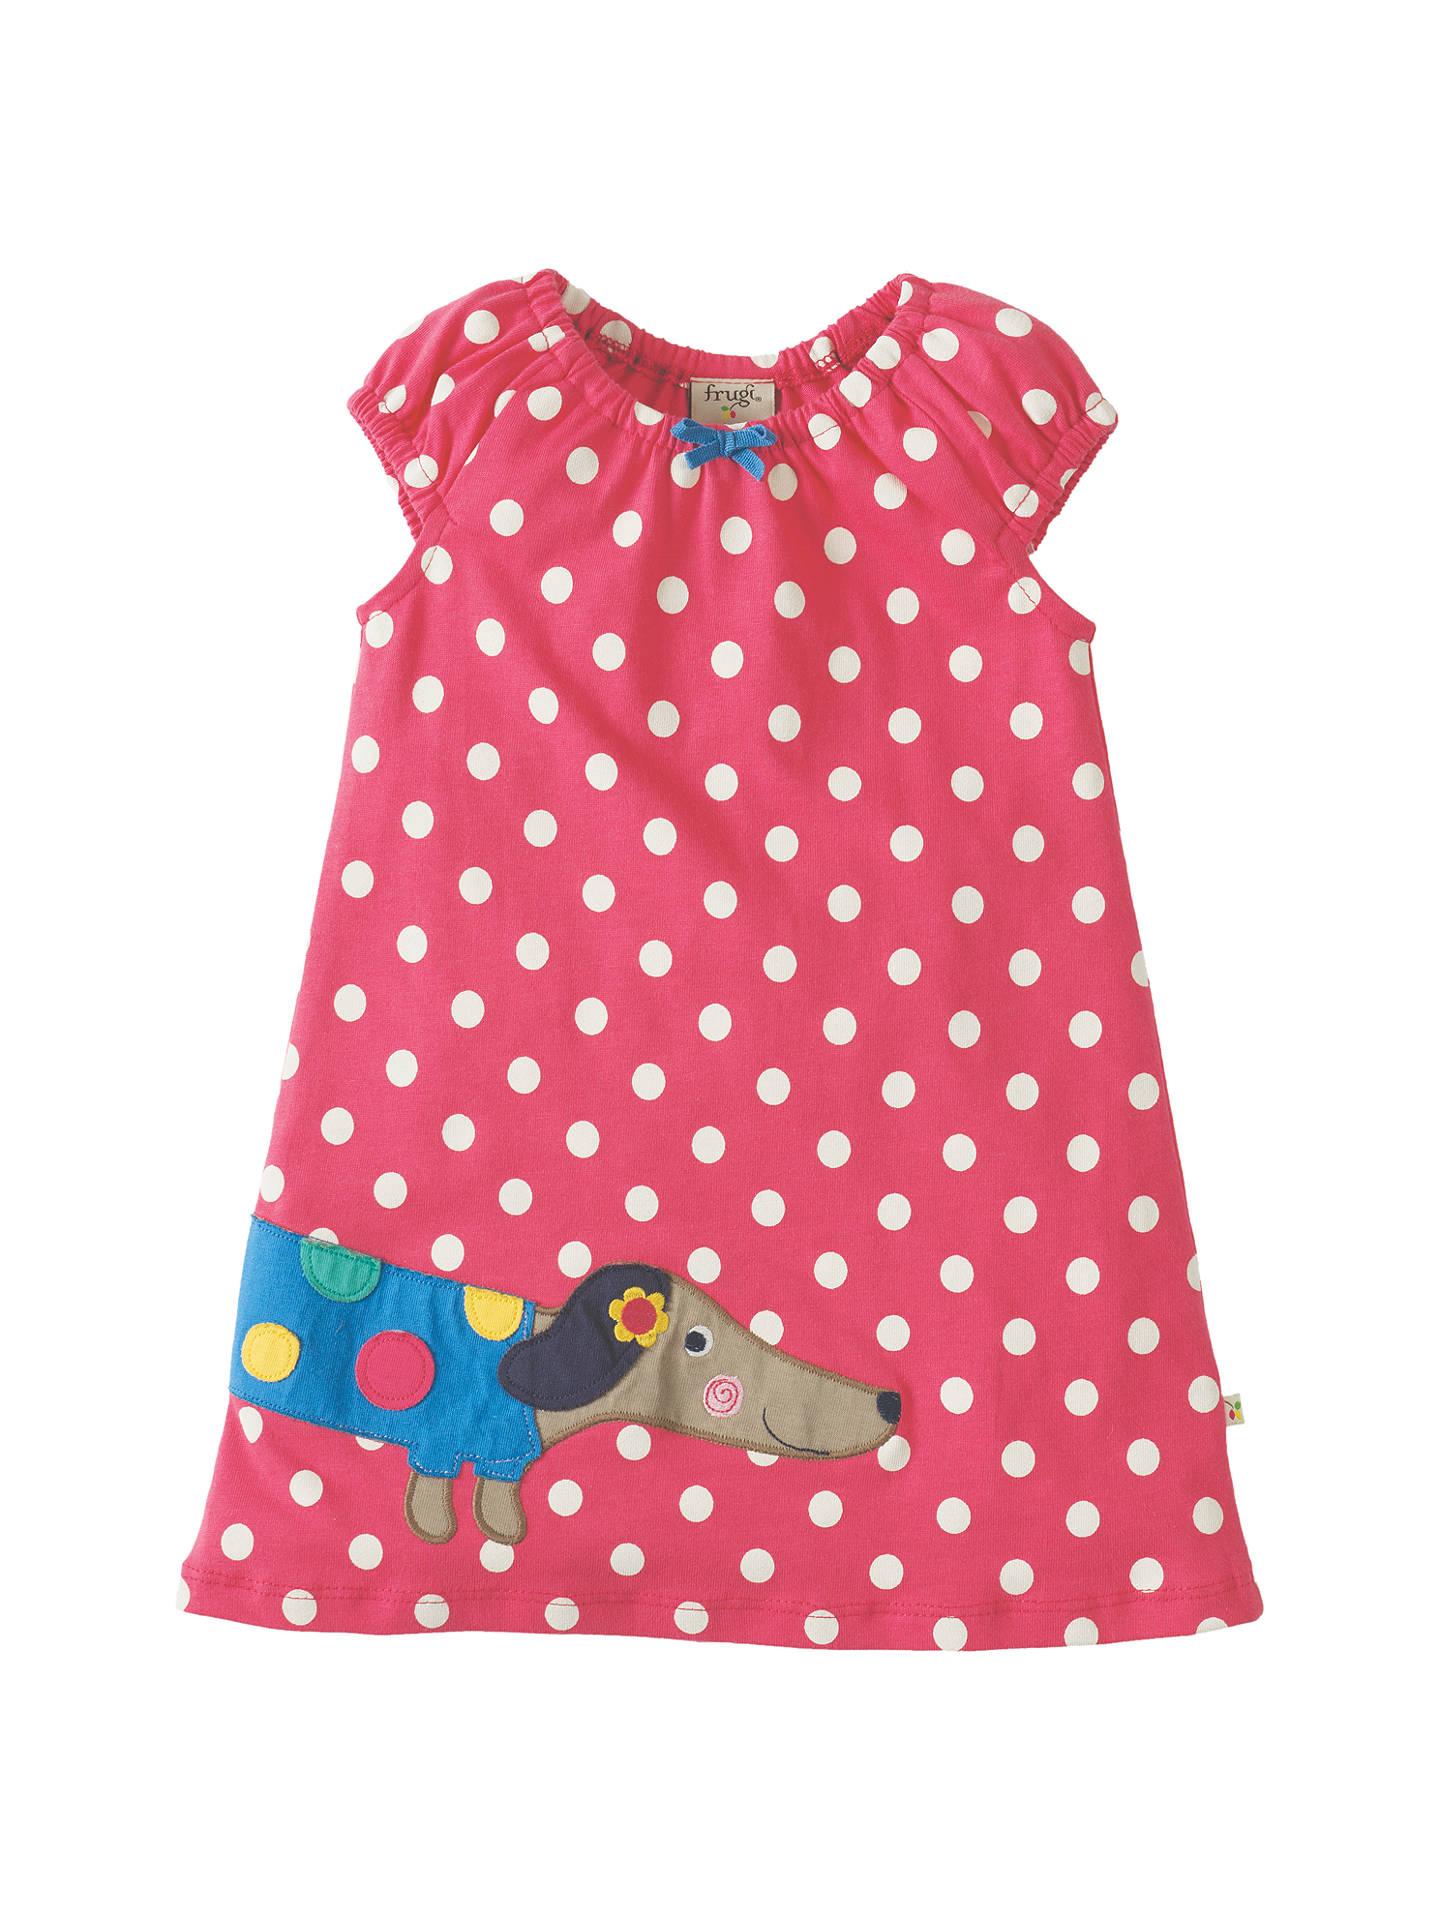 5bf9c7464 Frugi Organic Baby Lola Dog Polka Dot Jersey Dress